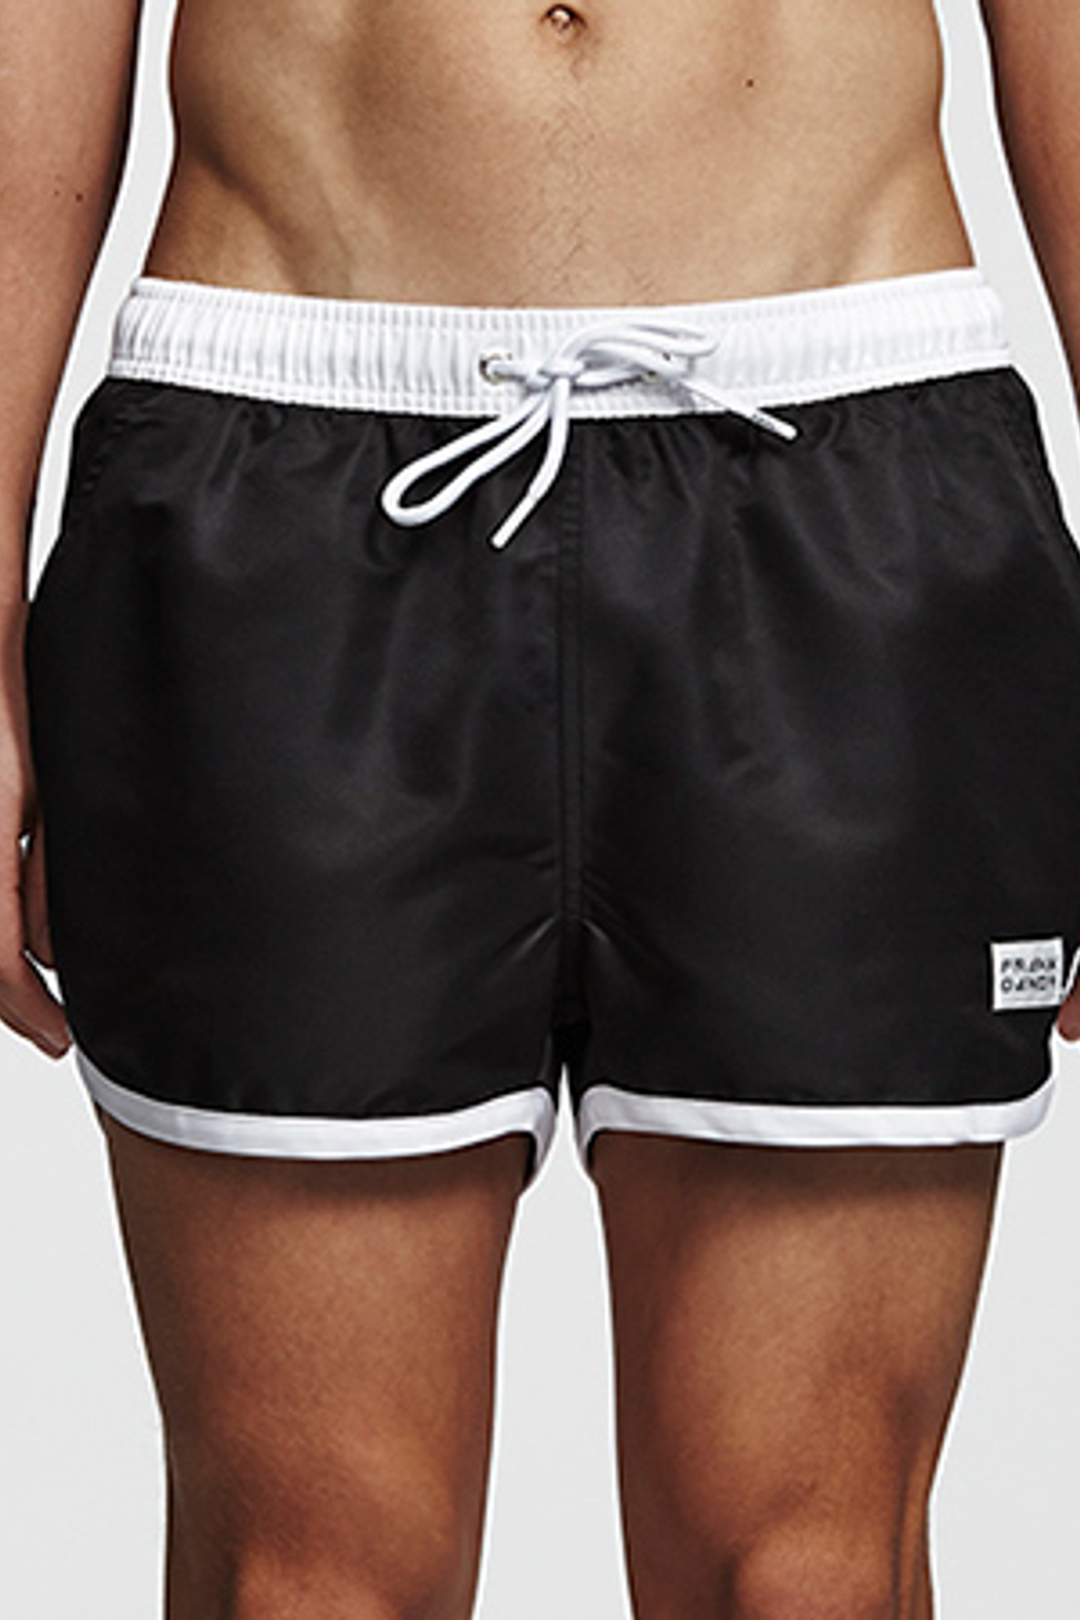 St Paul Swimshorts - Black